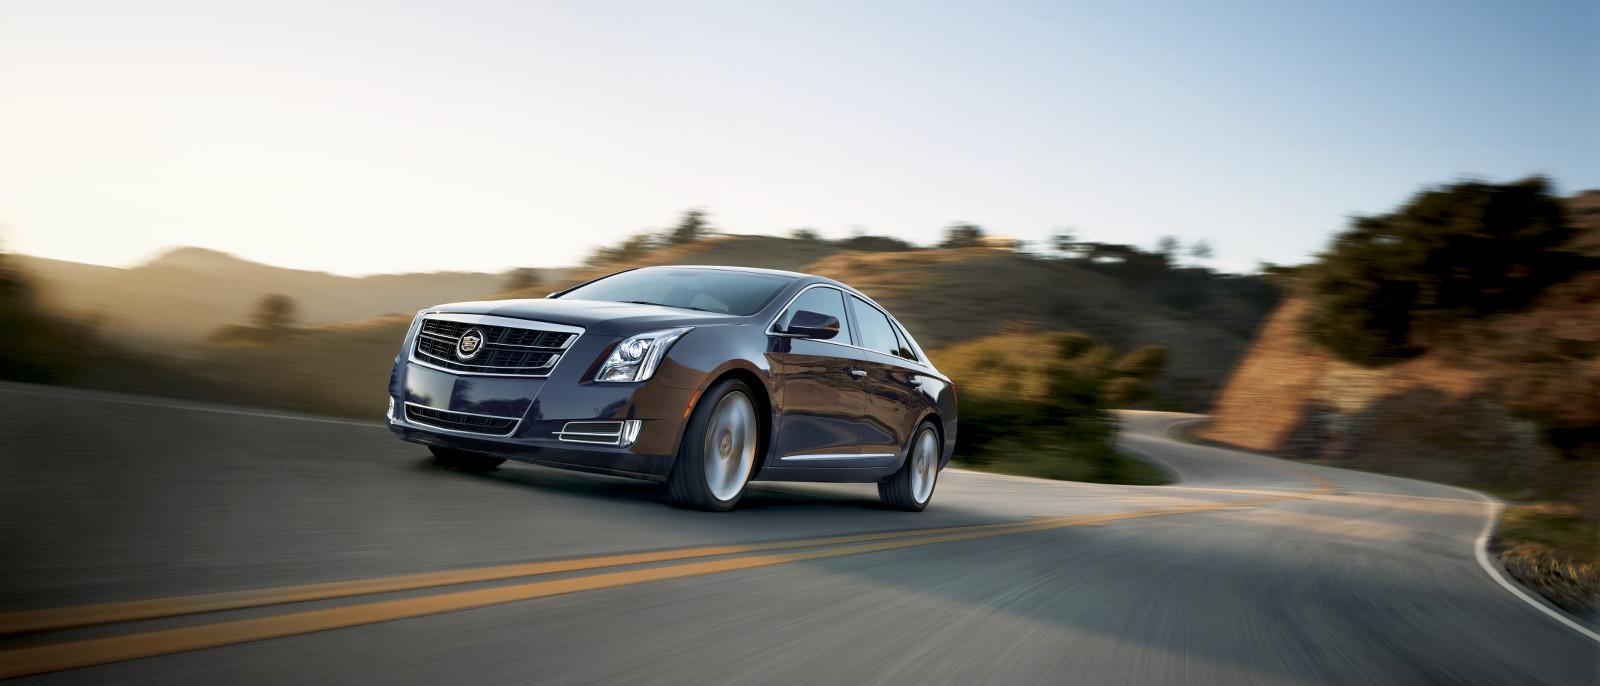 2015 Cadillac Xts Barrington Chicago Motor Werks Cadillac